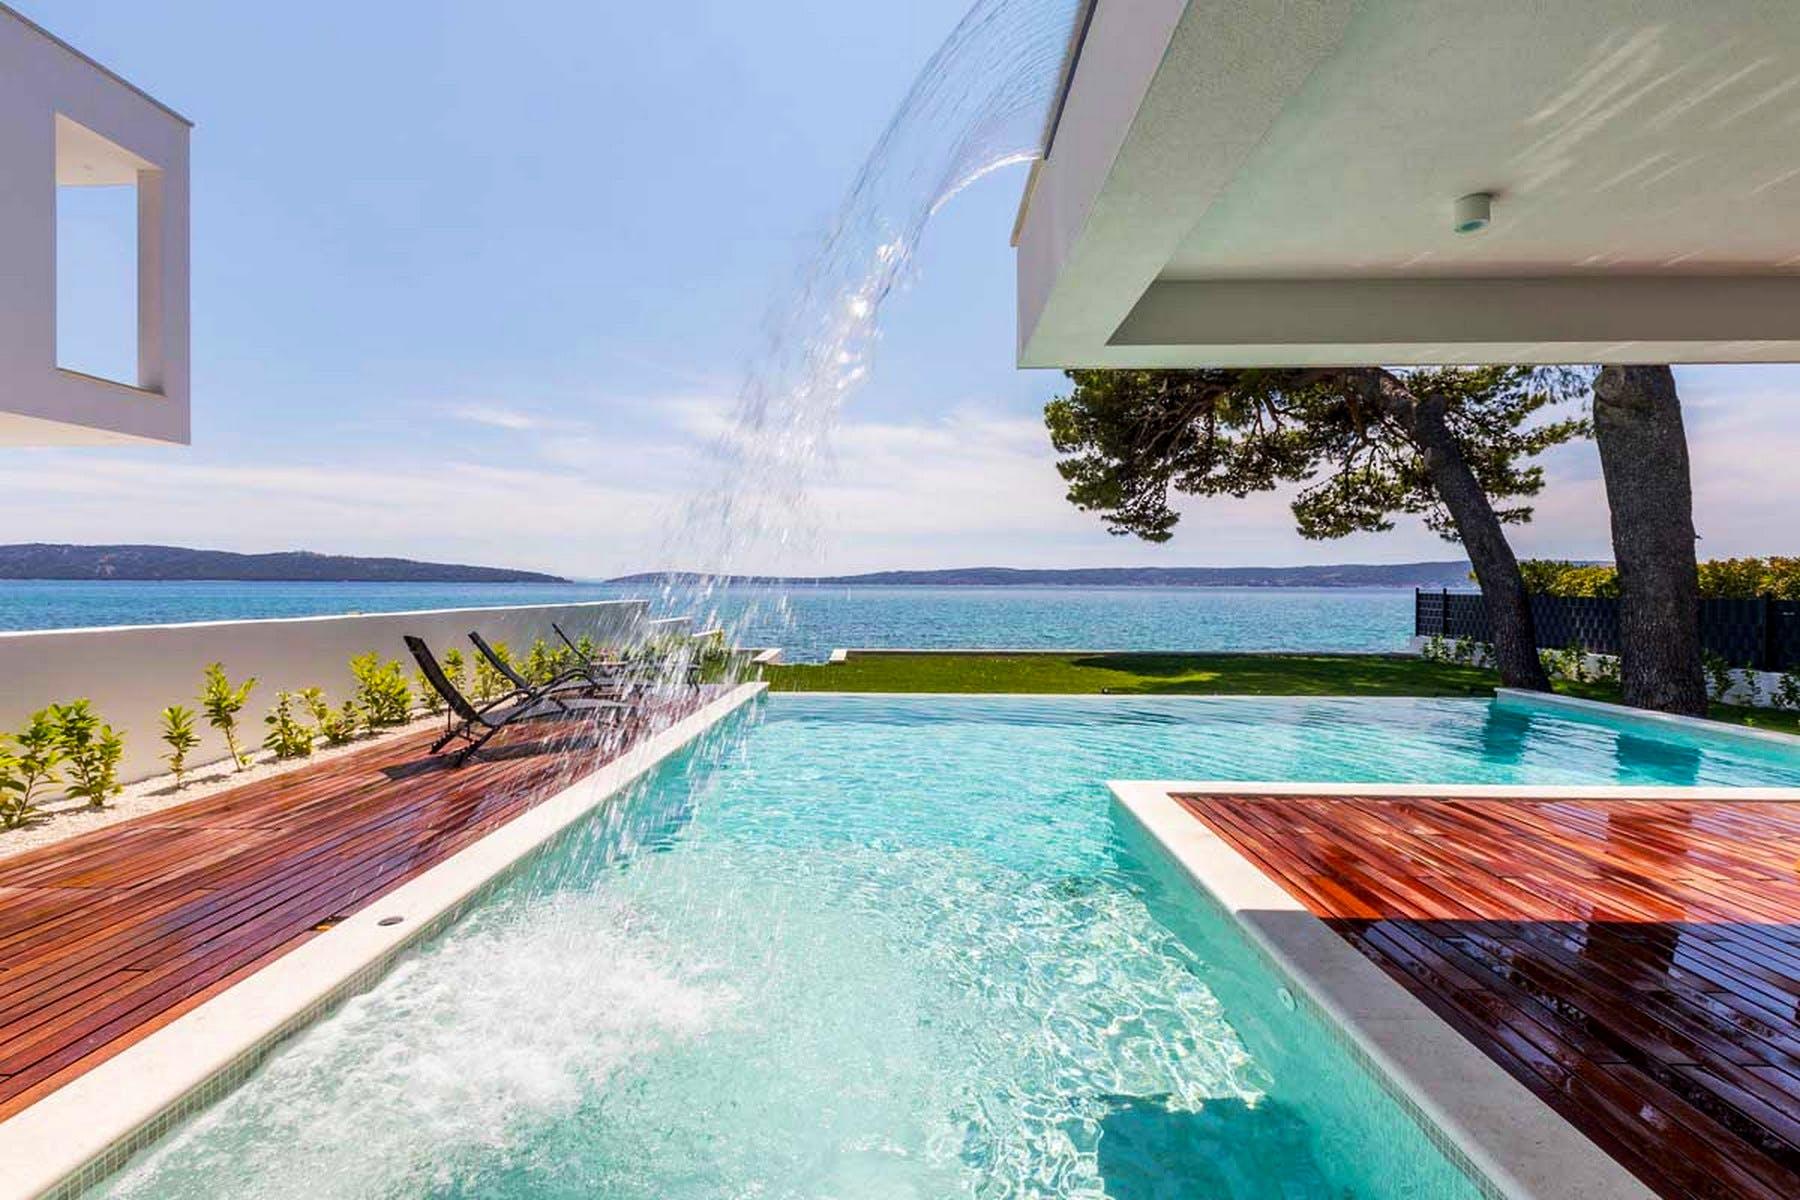 Amazing private pool